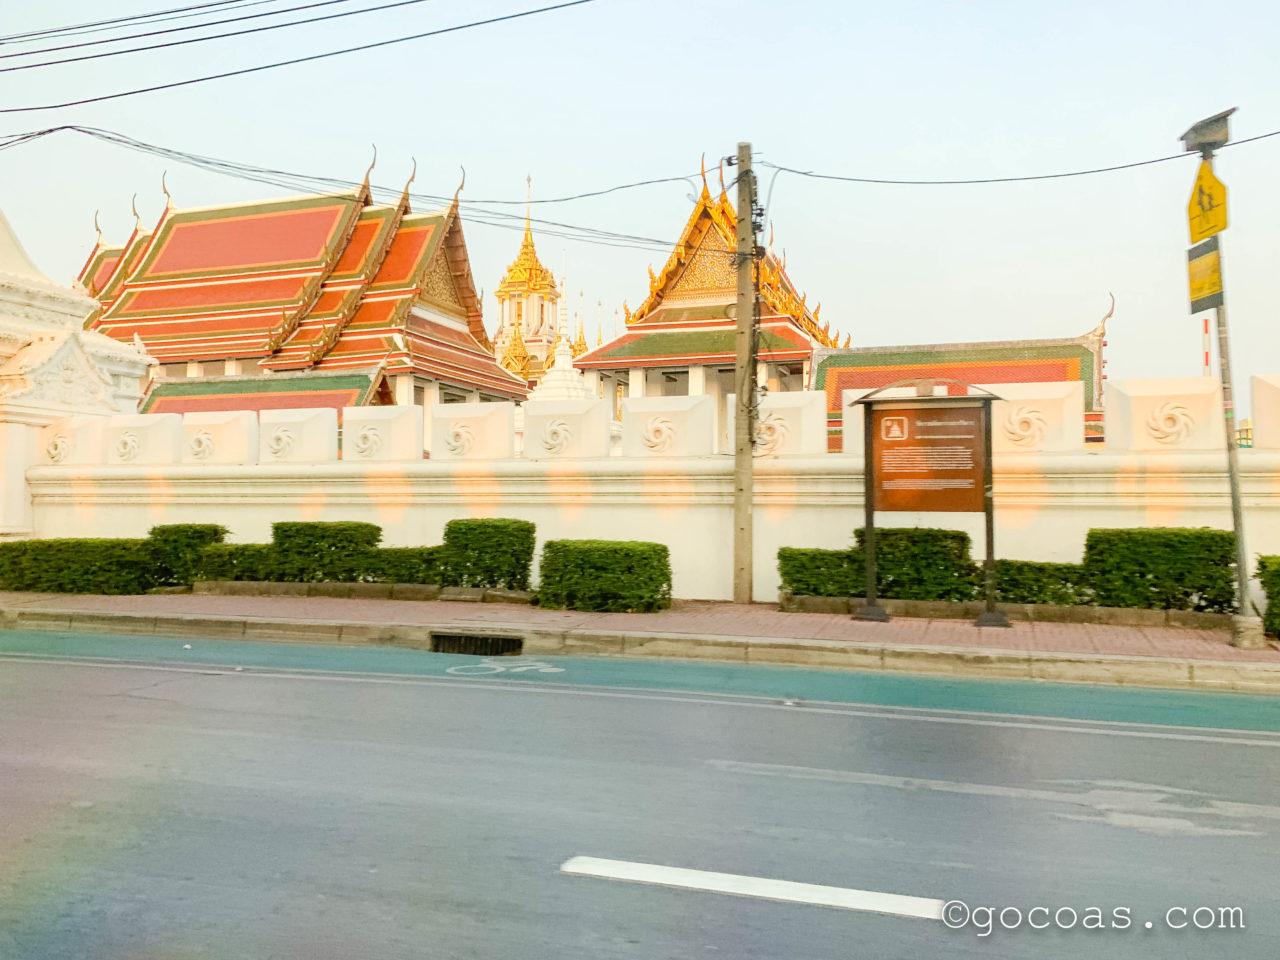 Hua Lamphong駅に行く途中の車内から見たバンコク市内の景色